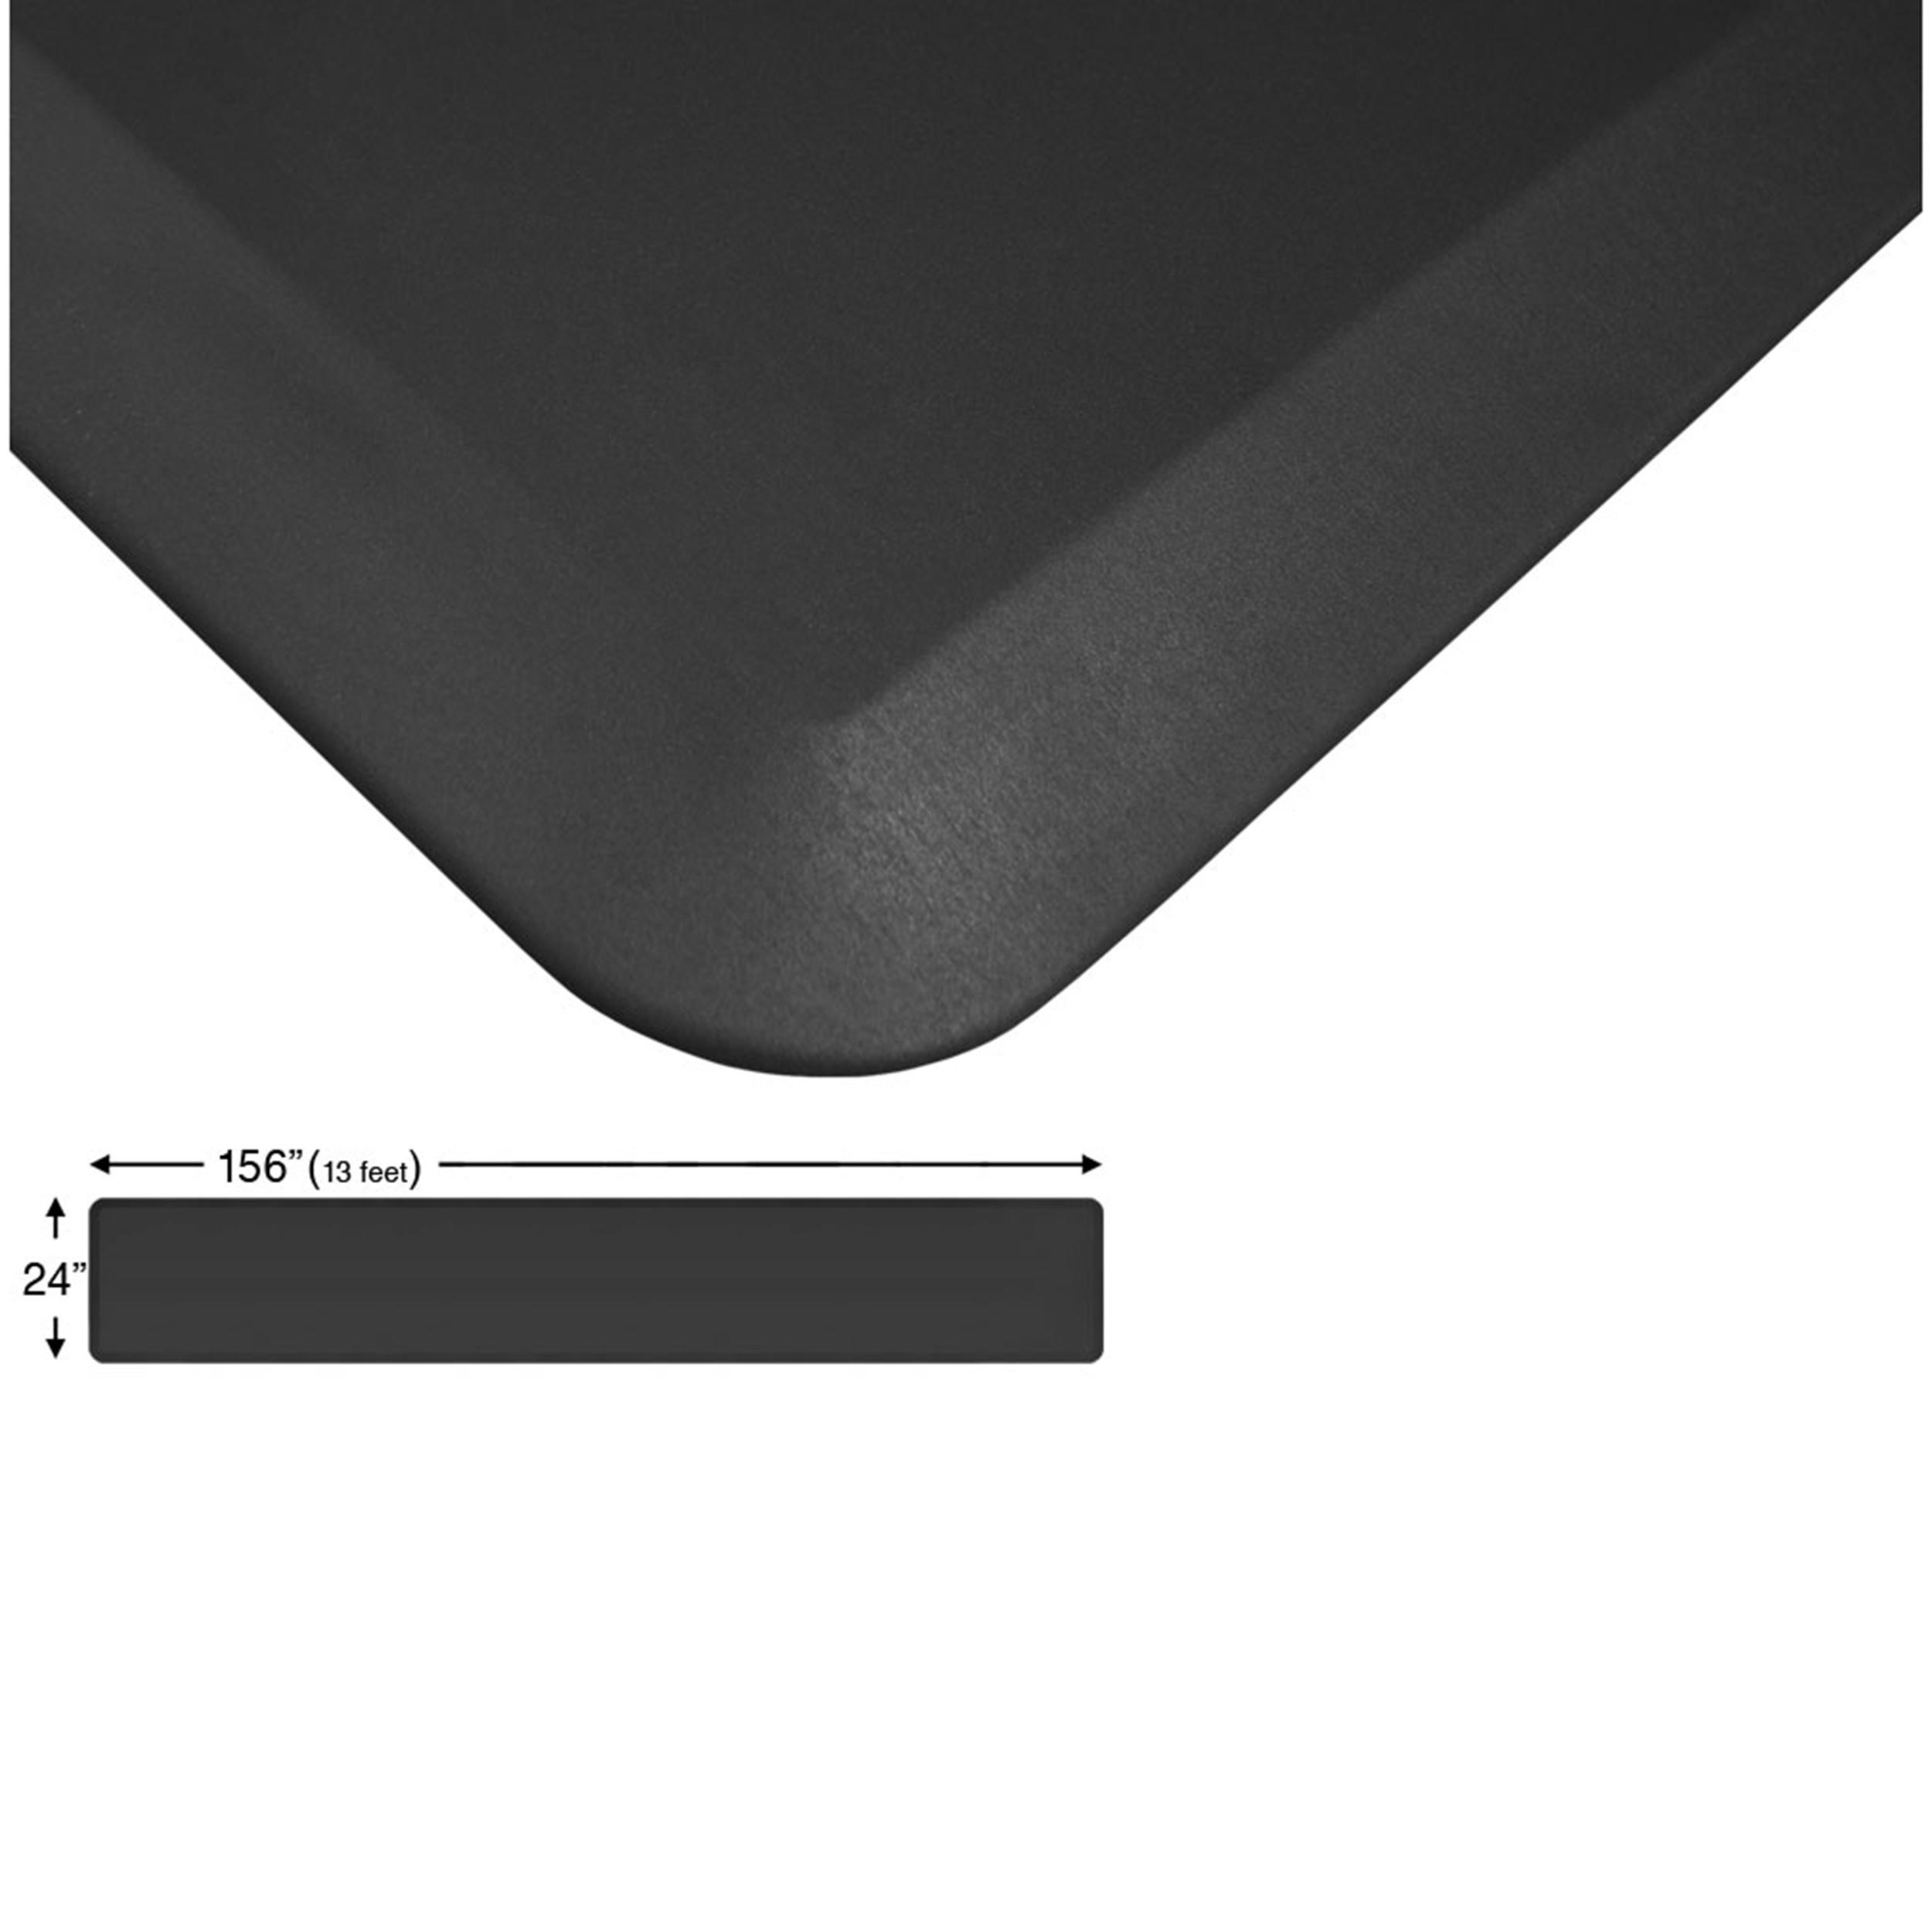 Eco-Pro Continuous Comfort Mat, Black, 24